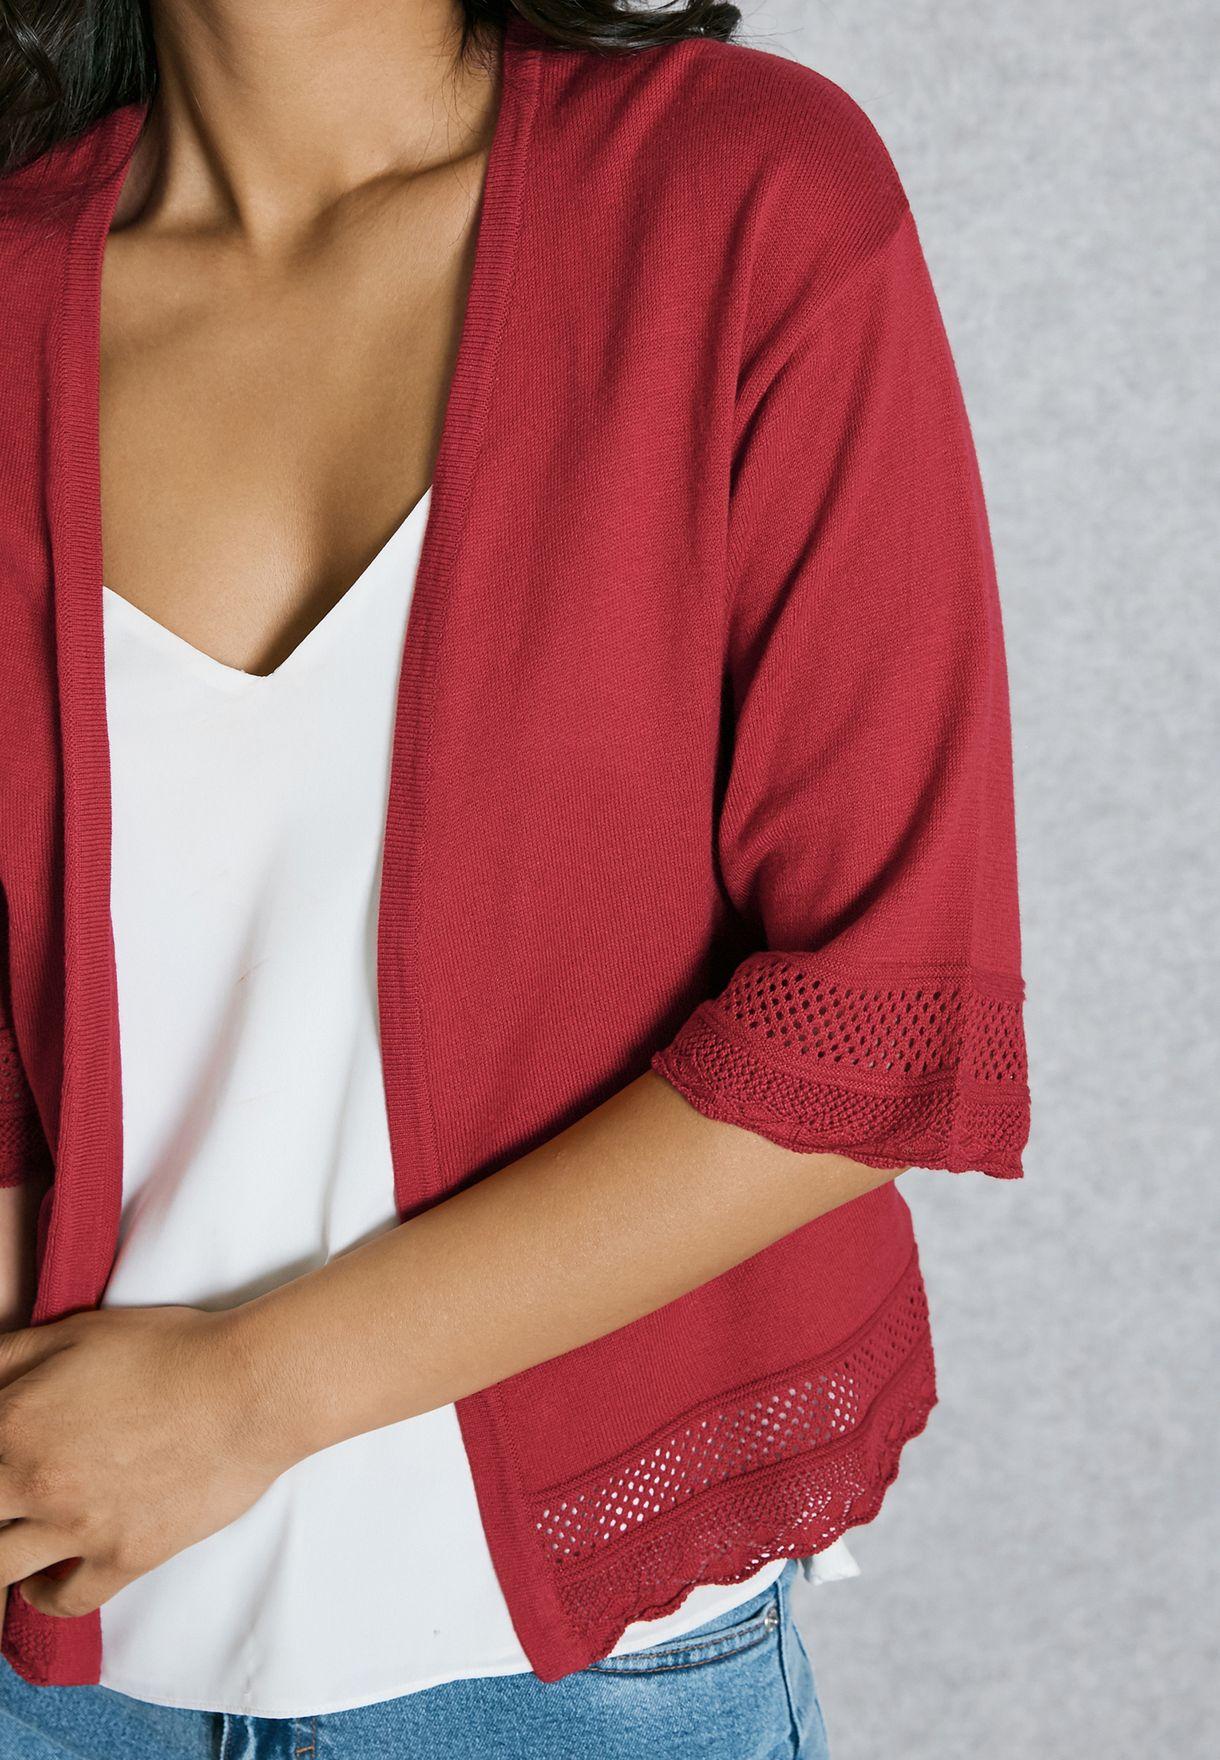 Crochet Detail Cardigan